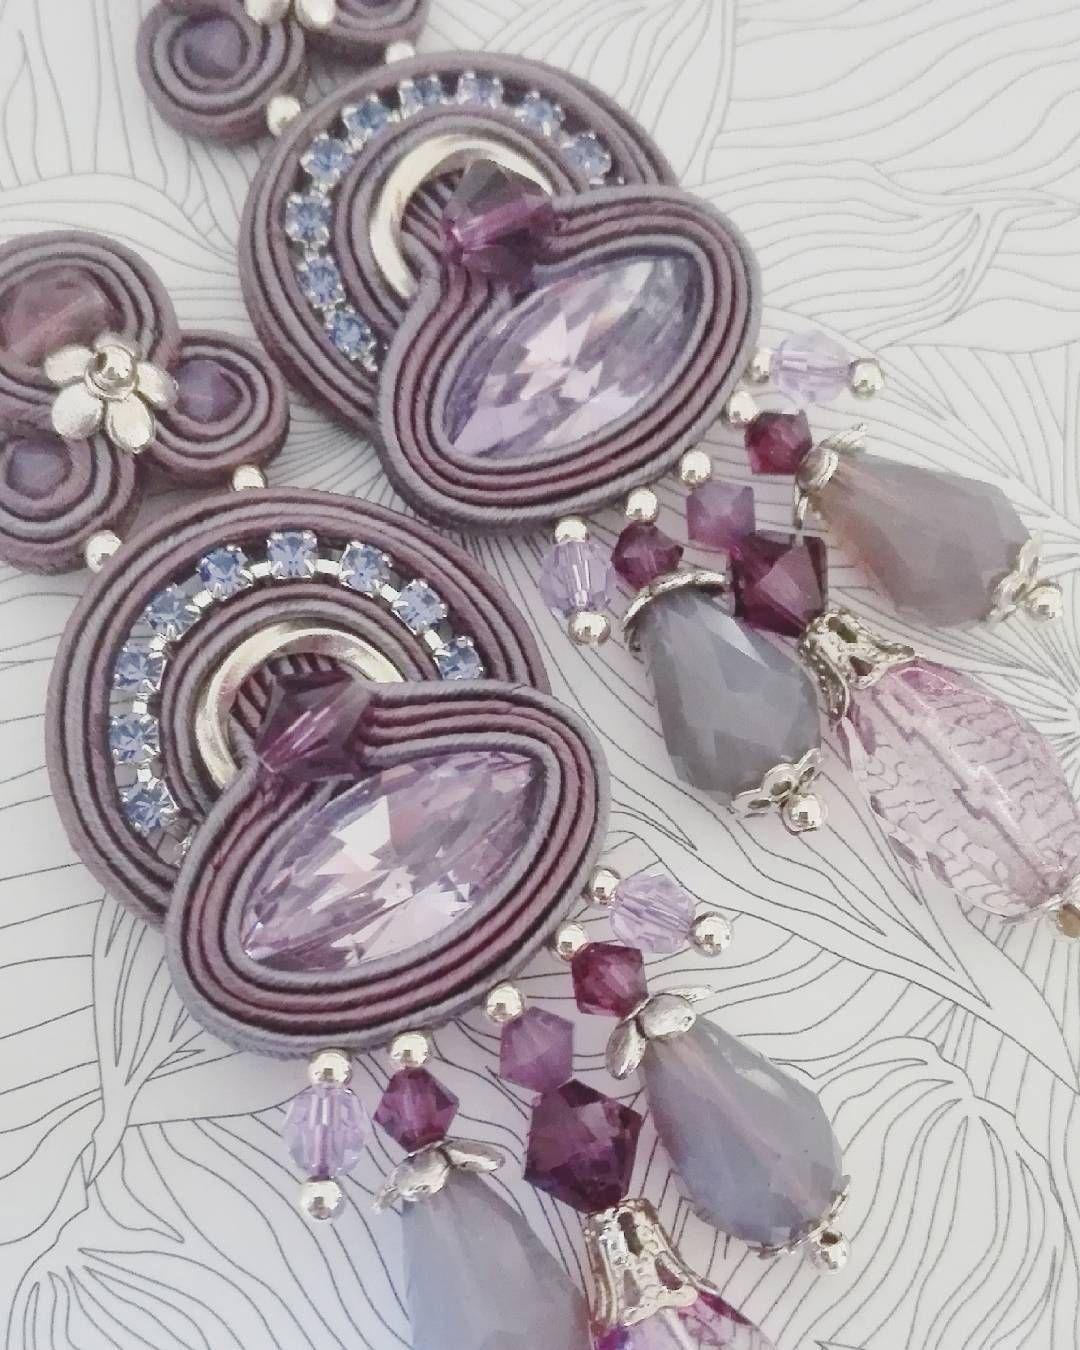 """ED"" collection. Provence colours. Dori inspired. #adelslaboratory #alessandradelvitto #adeloriginal #everydaycollection #ed #bijoux #costumejewelry #accessori #gioielleriaalternativa #soutache #soutacheearrings #earrings #orecchini #fashion #fashionjewelry #fashionblogger #fashiondesigner #moda #milano #varese #nyc #losangeles #handembroidered #handmade #madeinitaly"